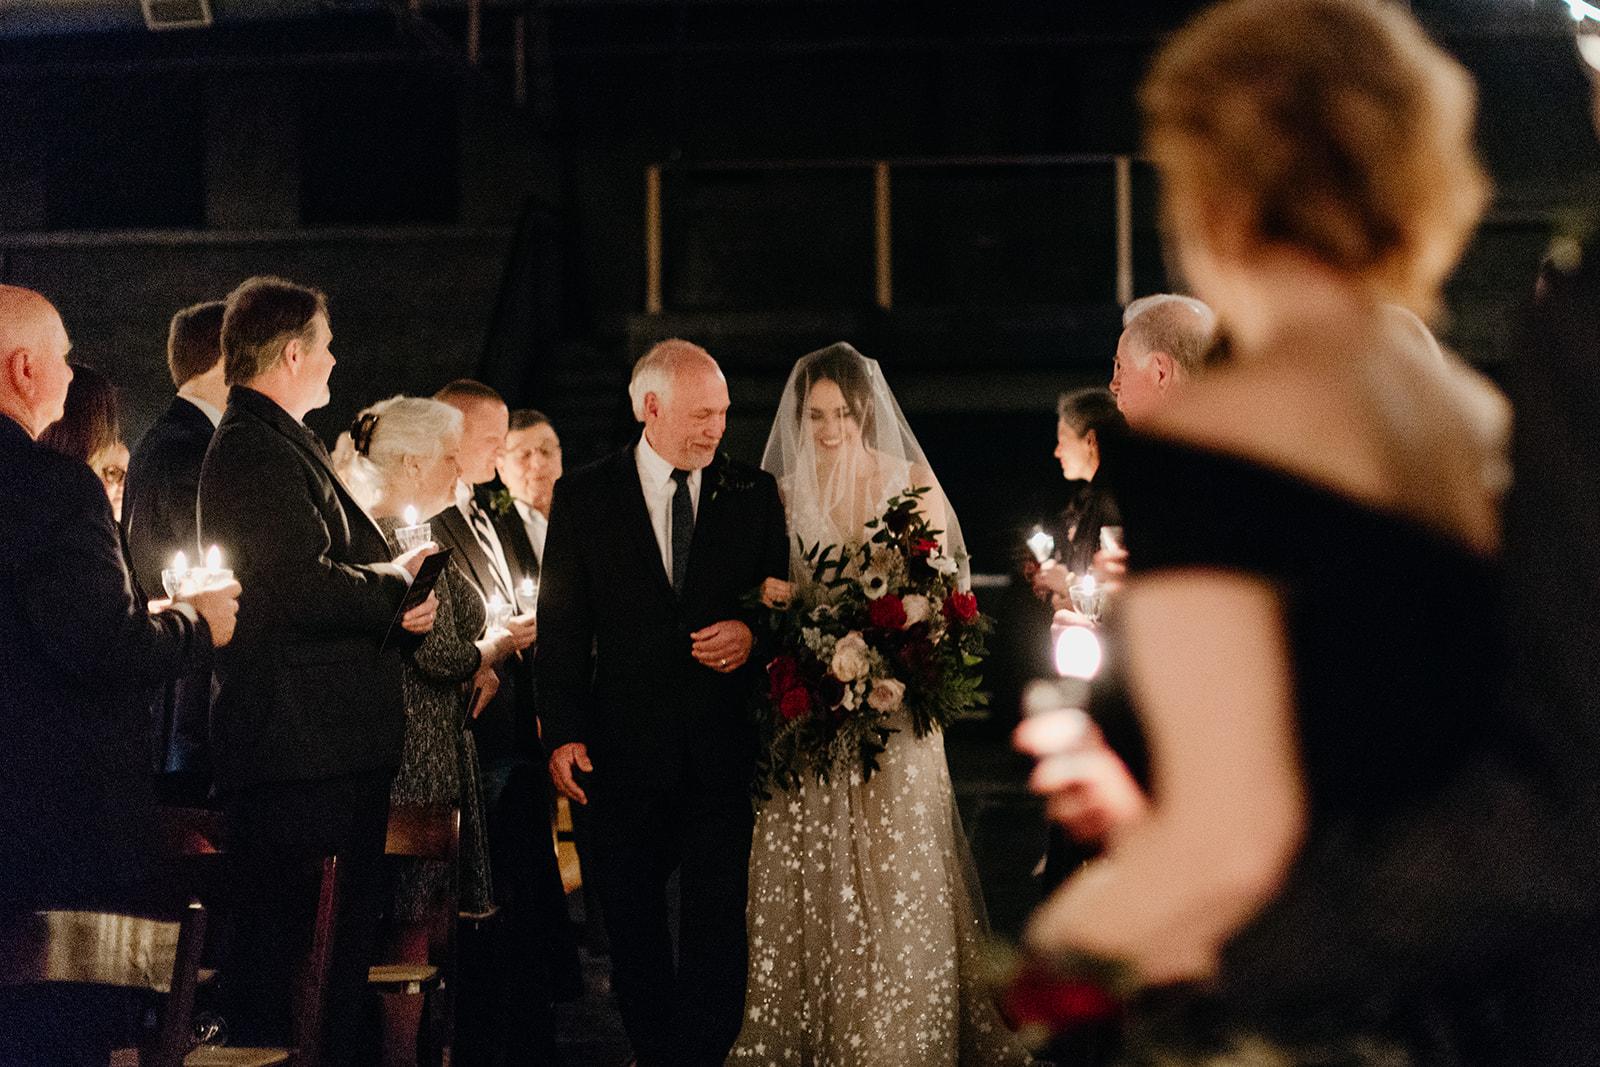 Candlelit entrance for the bride! Nashville Wedding flowers at Marathon Music Works.